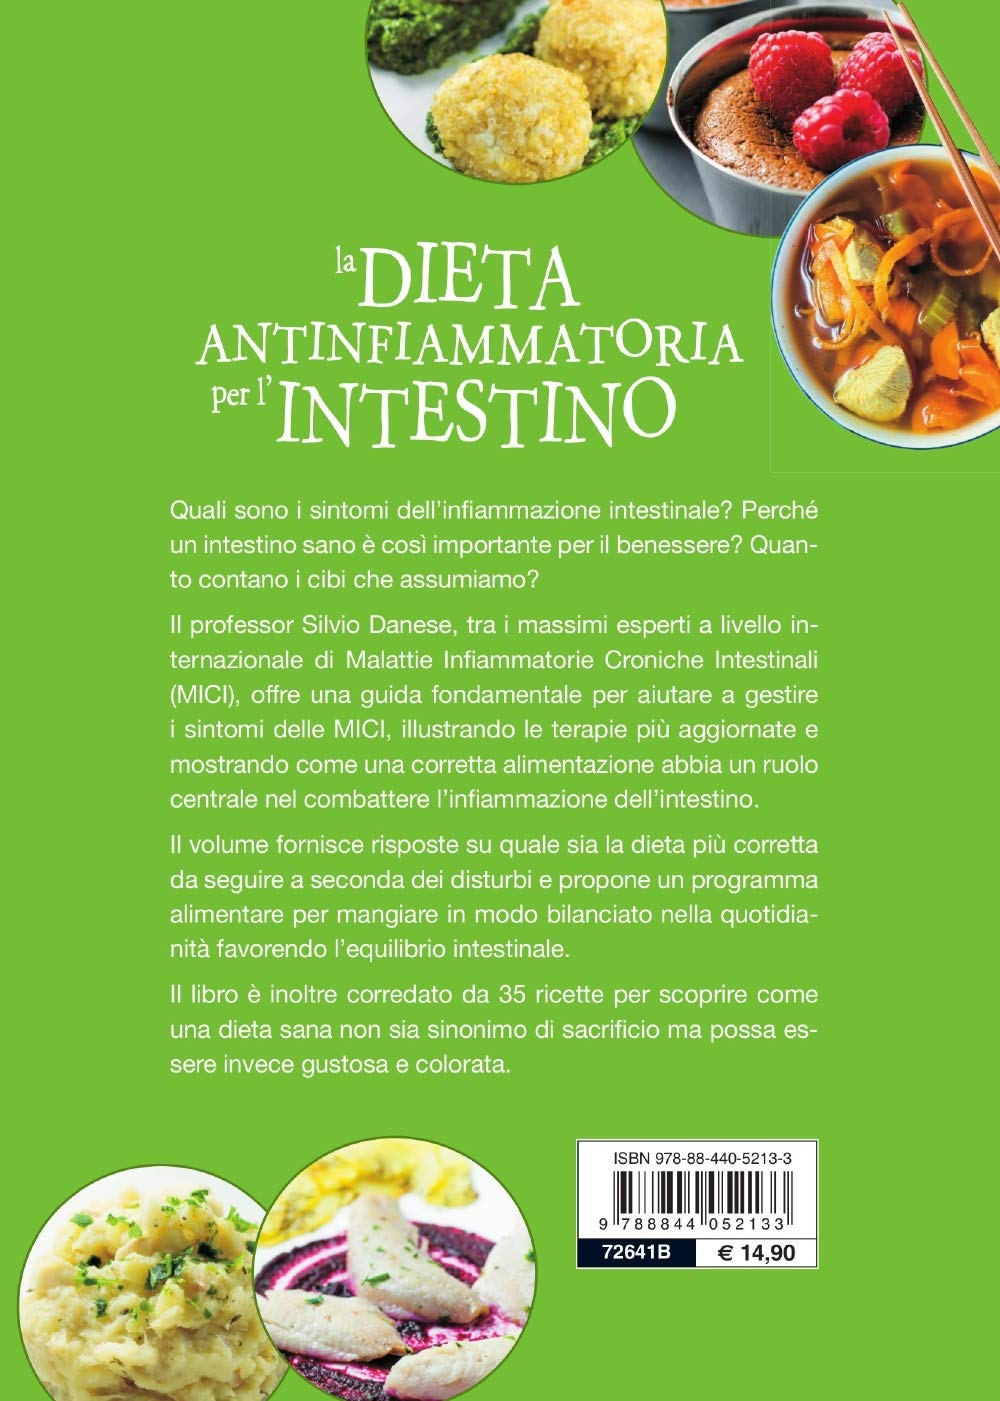 dieta per infiammazione intestino